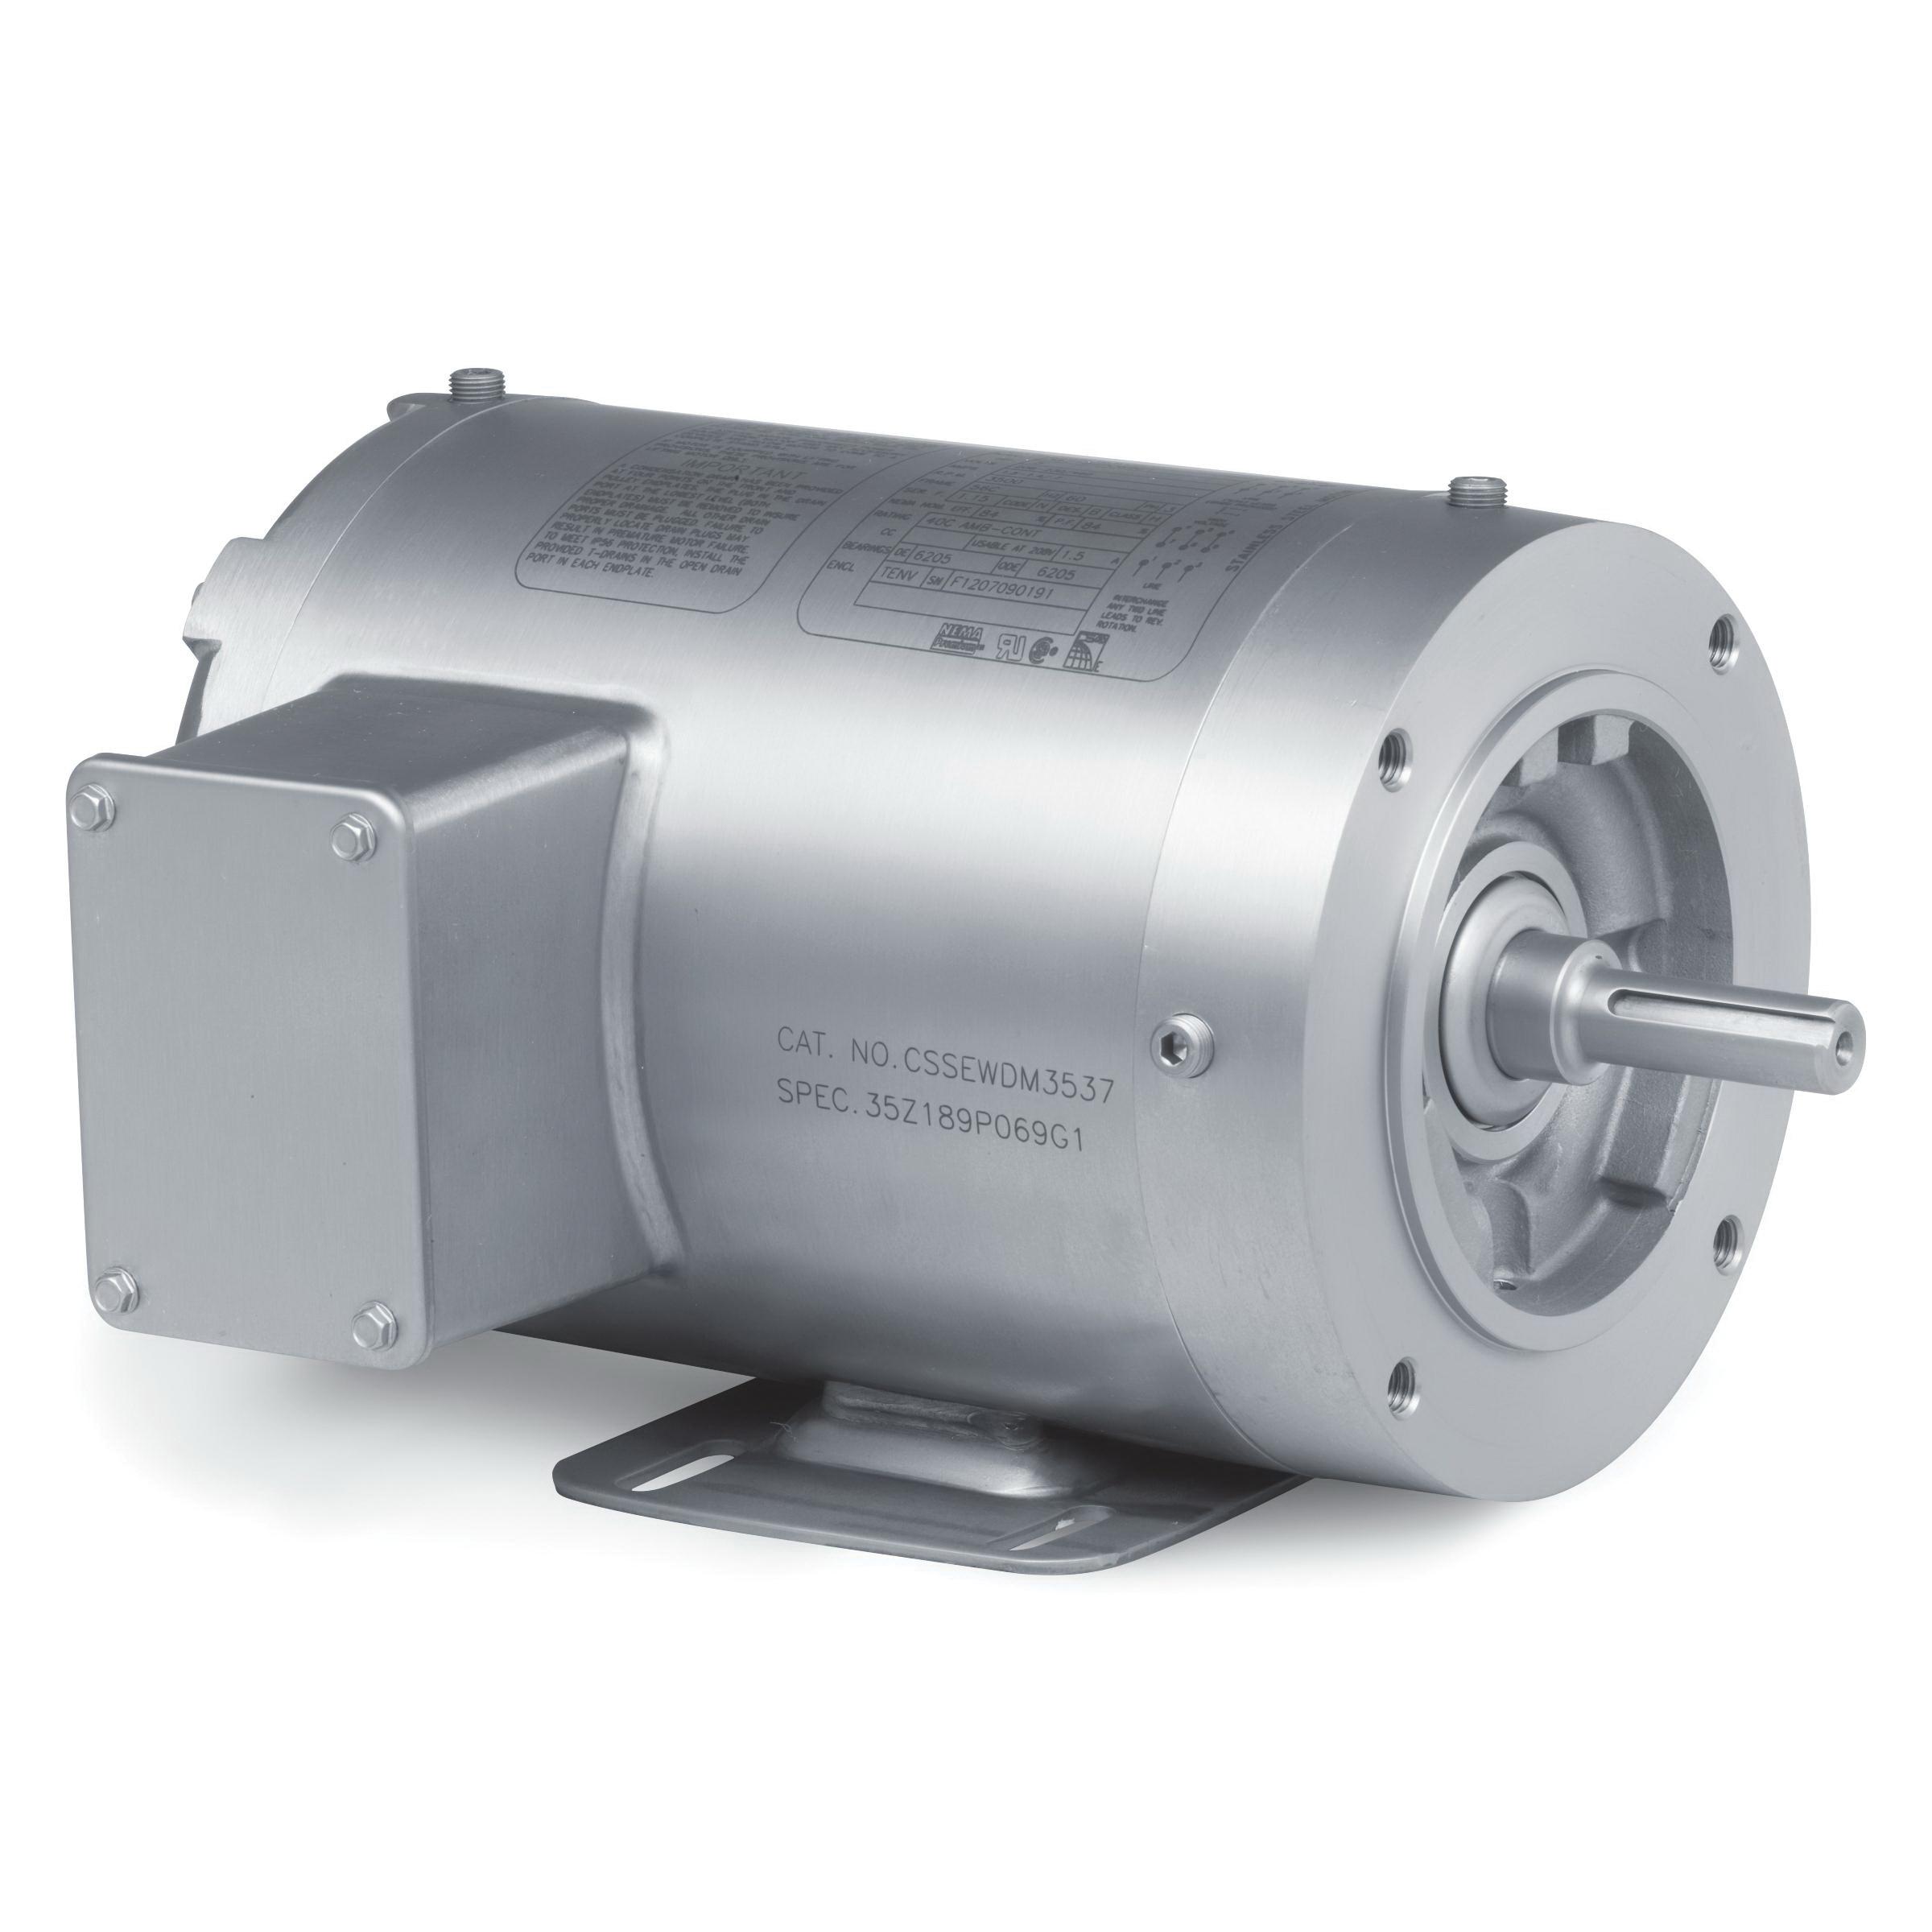 Baldor-Reliance CSSEWDM3537-5